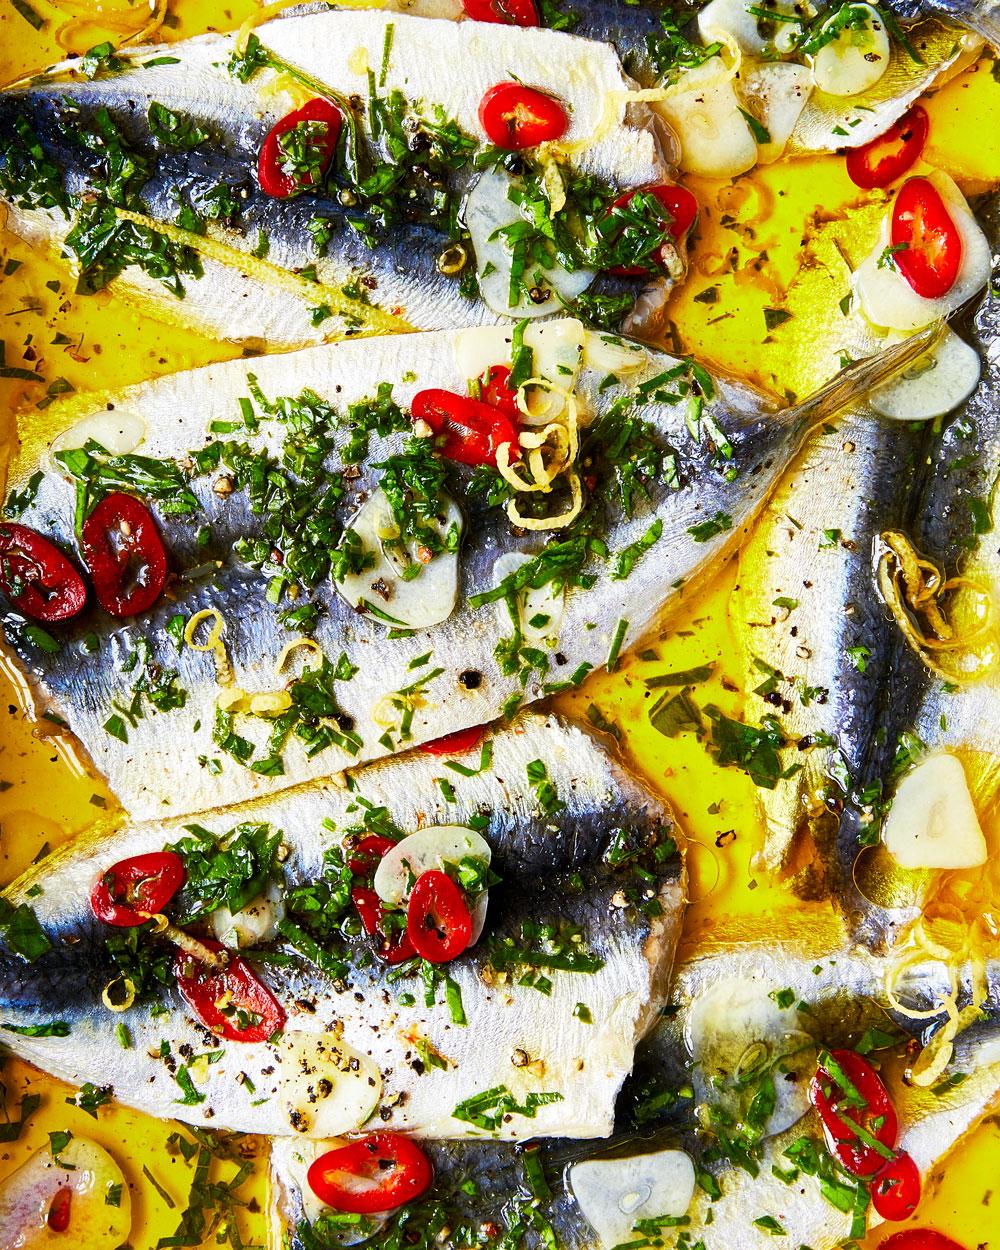 Food Stylist: Tamara Vos